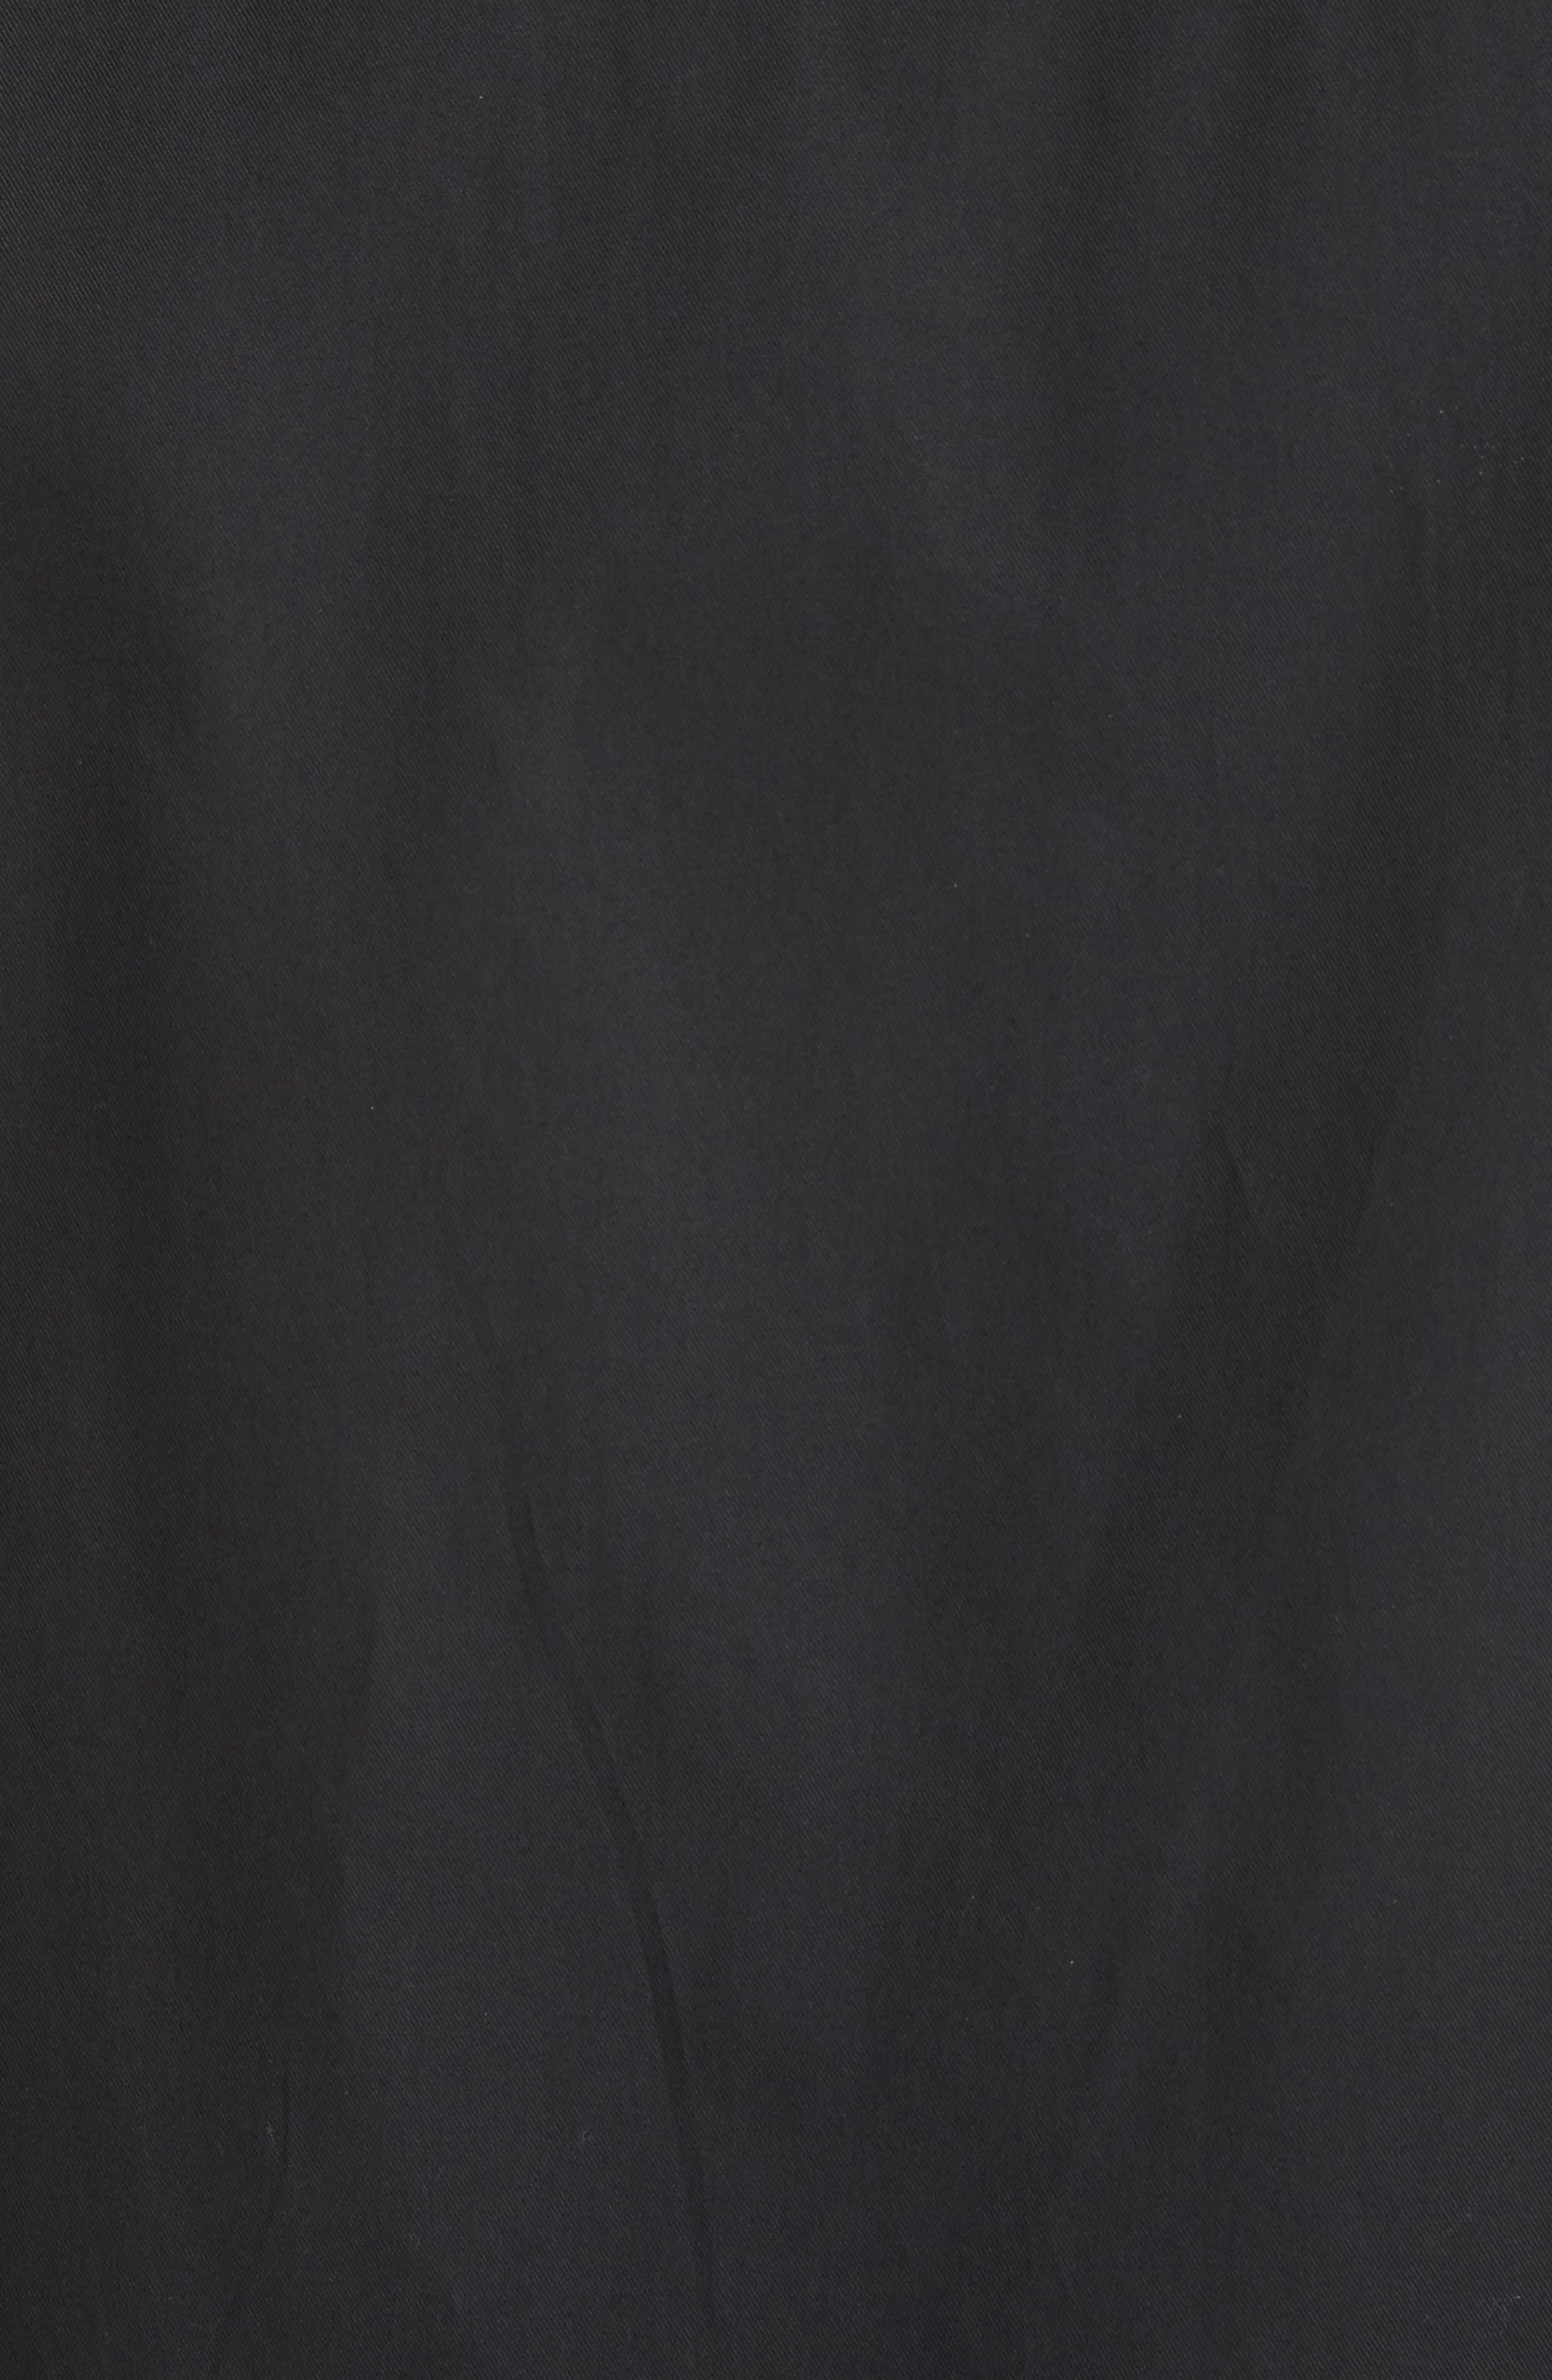 Short Sleeve Woven Shirt,                             Alternate thumbnail 5, color,                             001